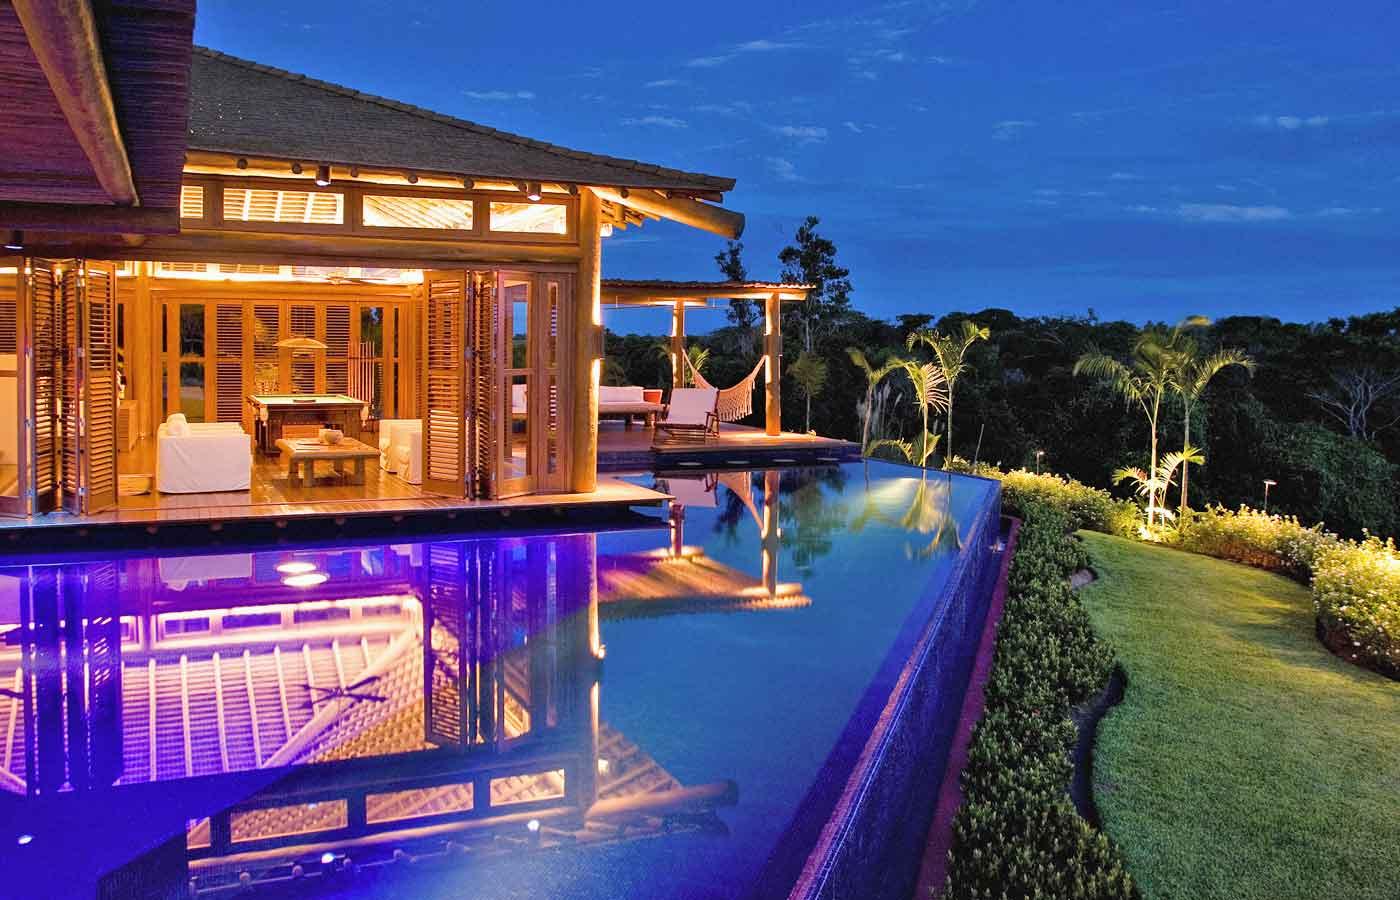 Villas de Trancoso - Luxury holidays to Trancoso, Brazil